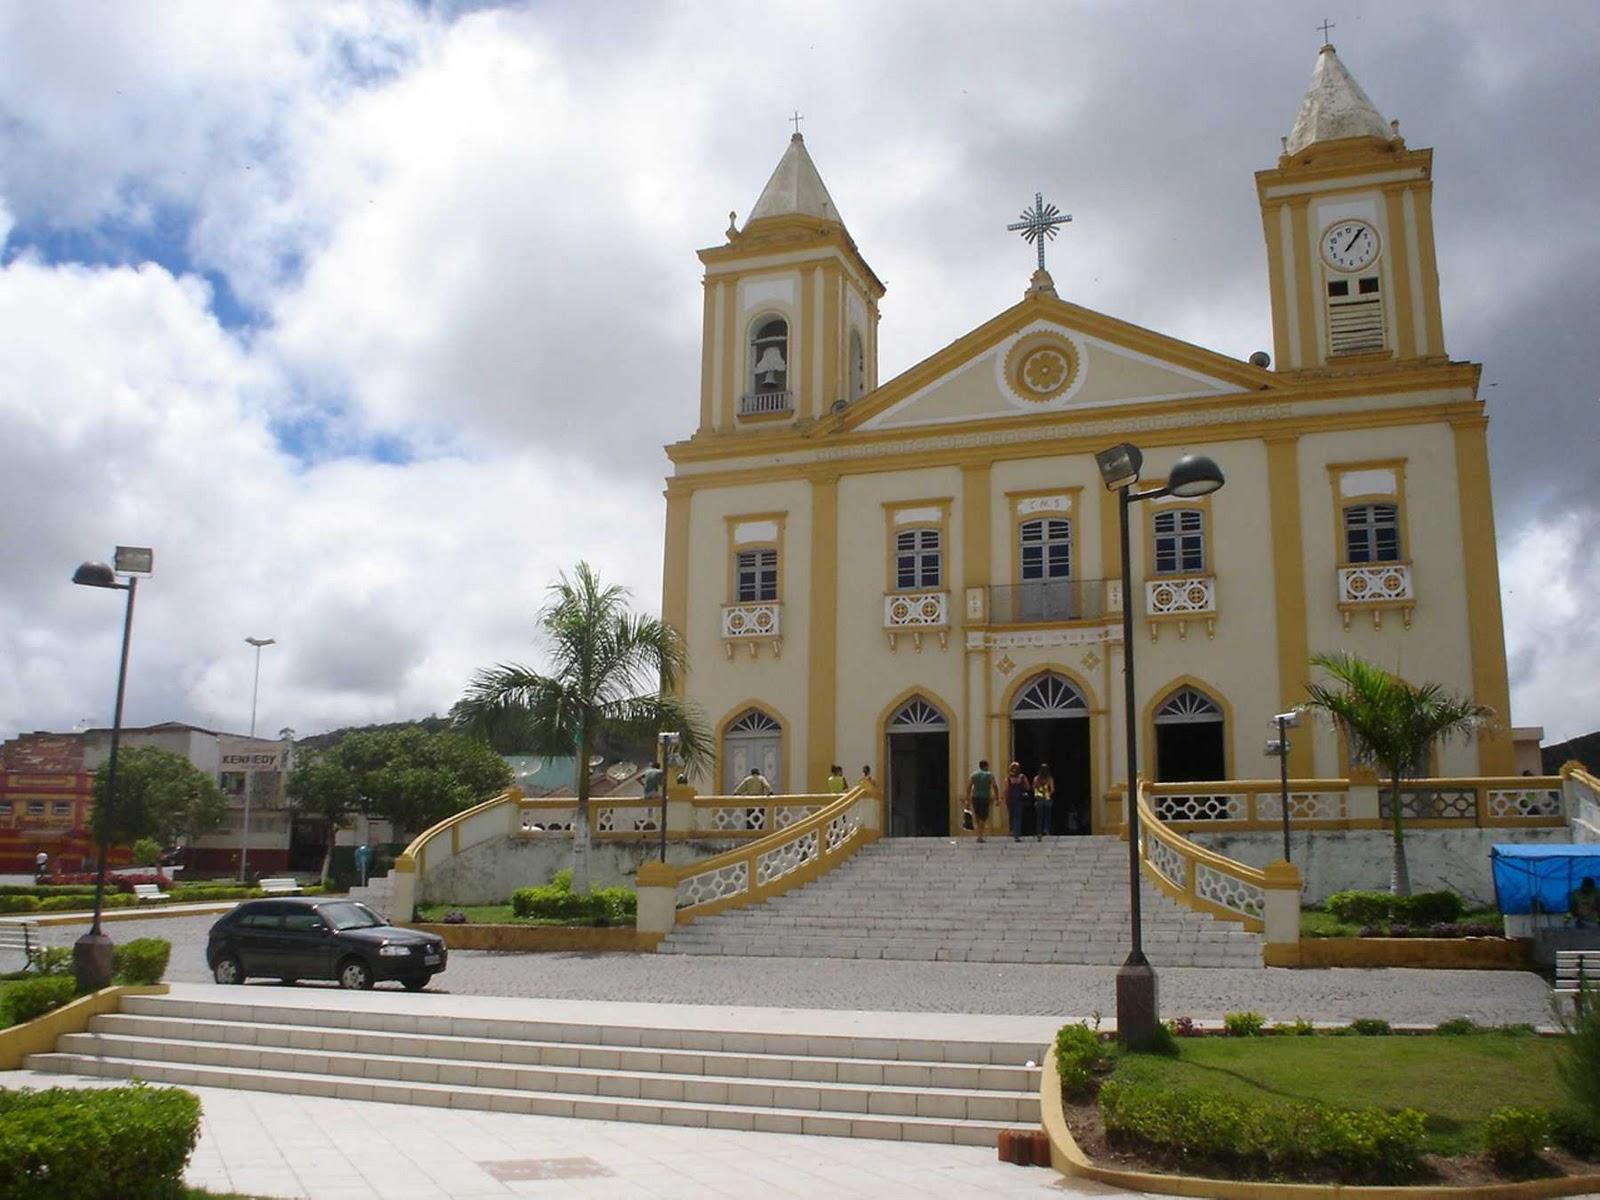 Bom Conselho Pernambuco fonte: 2.bp.blogspot.com